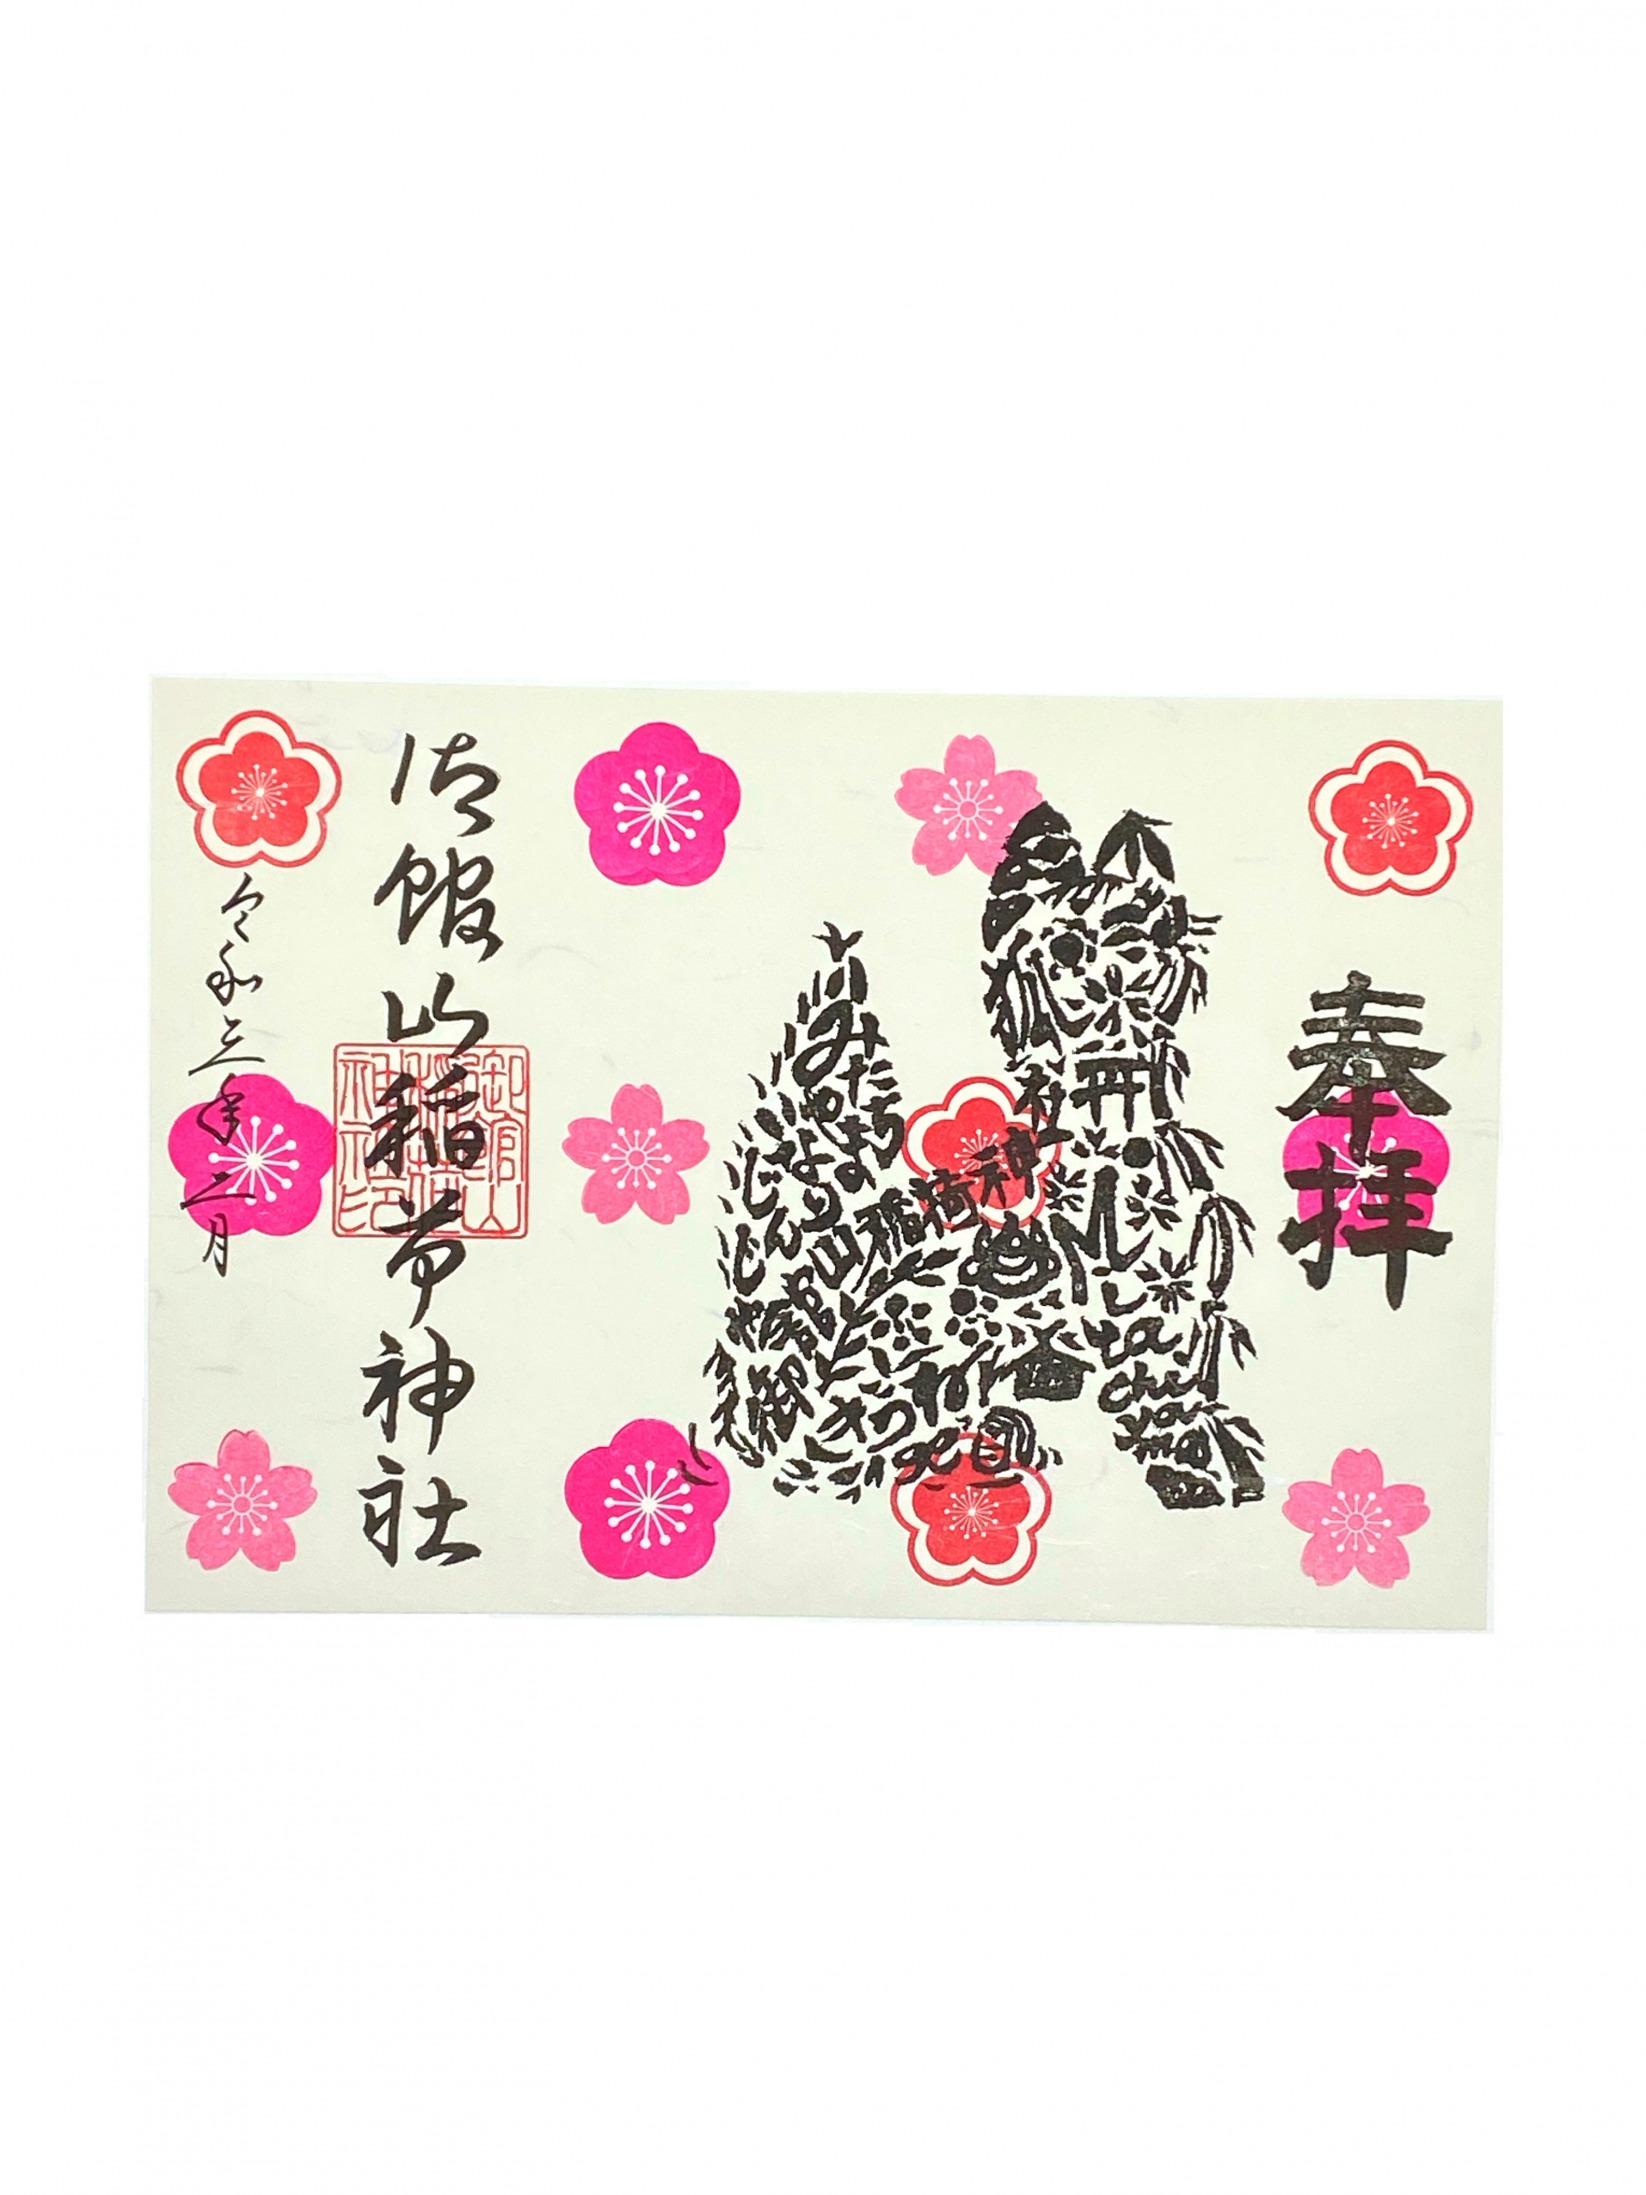 狐の文字絵御朱印(春季)